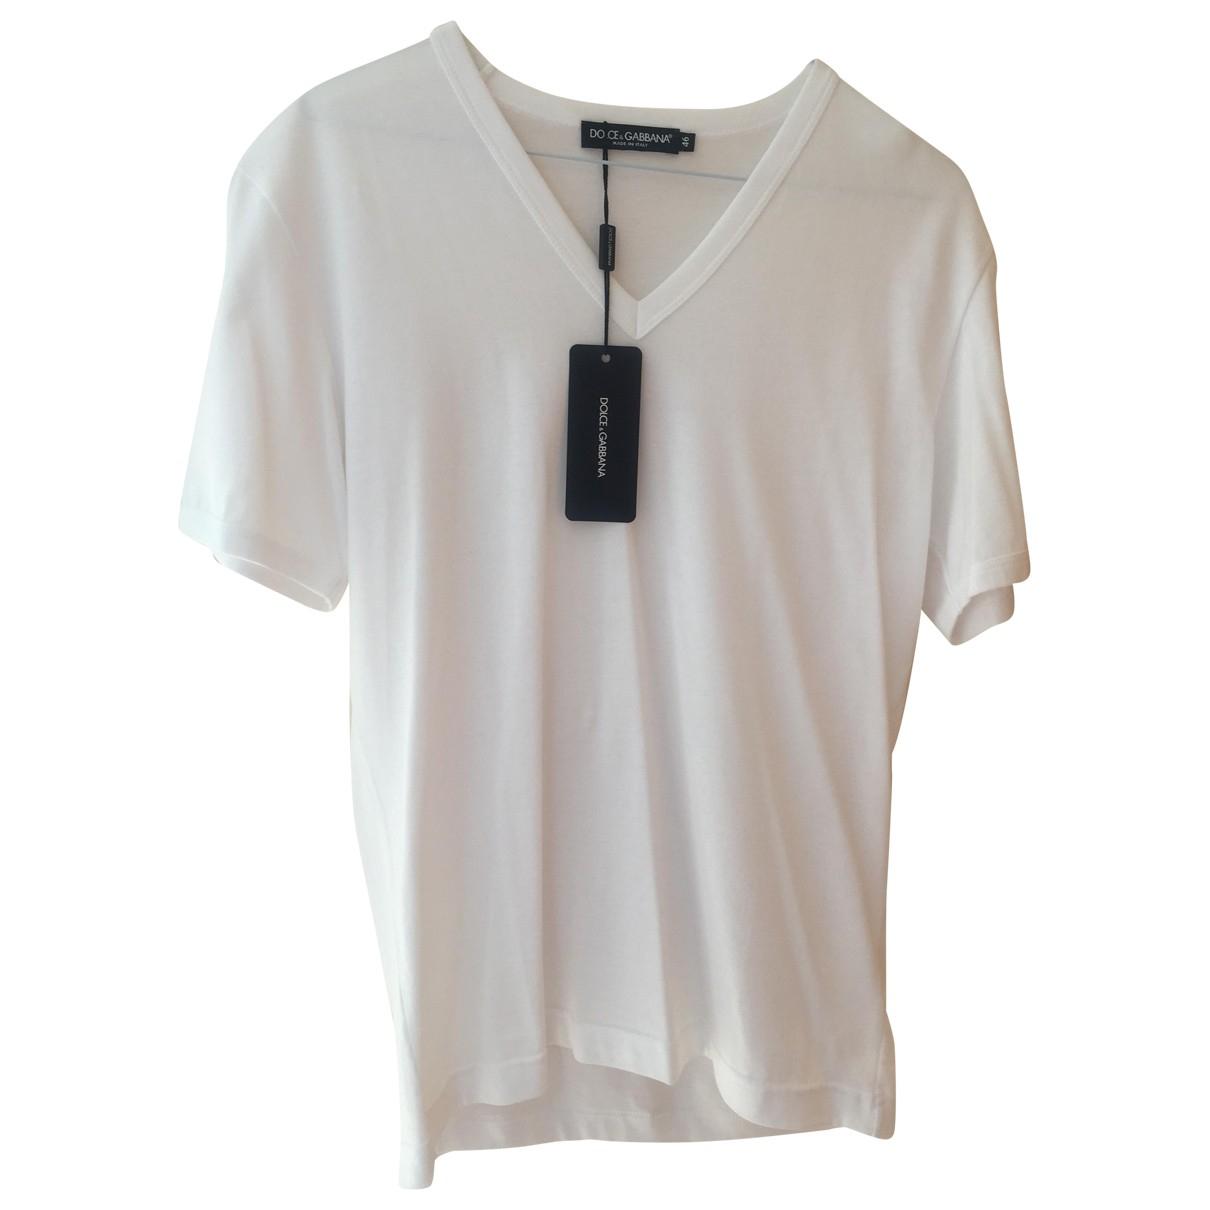 Dolce & Gabbana \N White Cotton T-shirts for Men S International